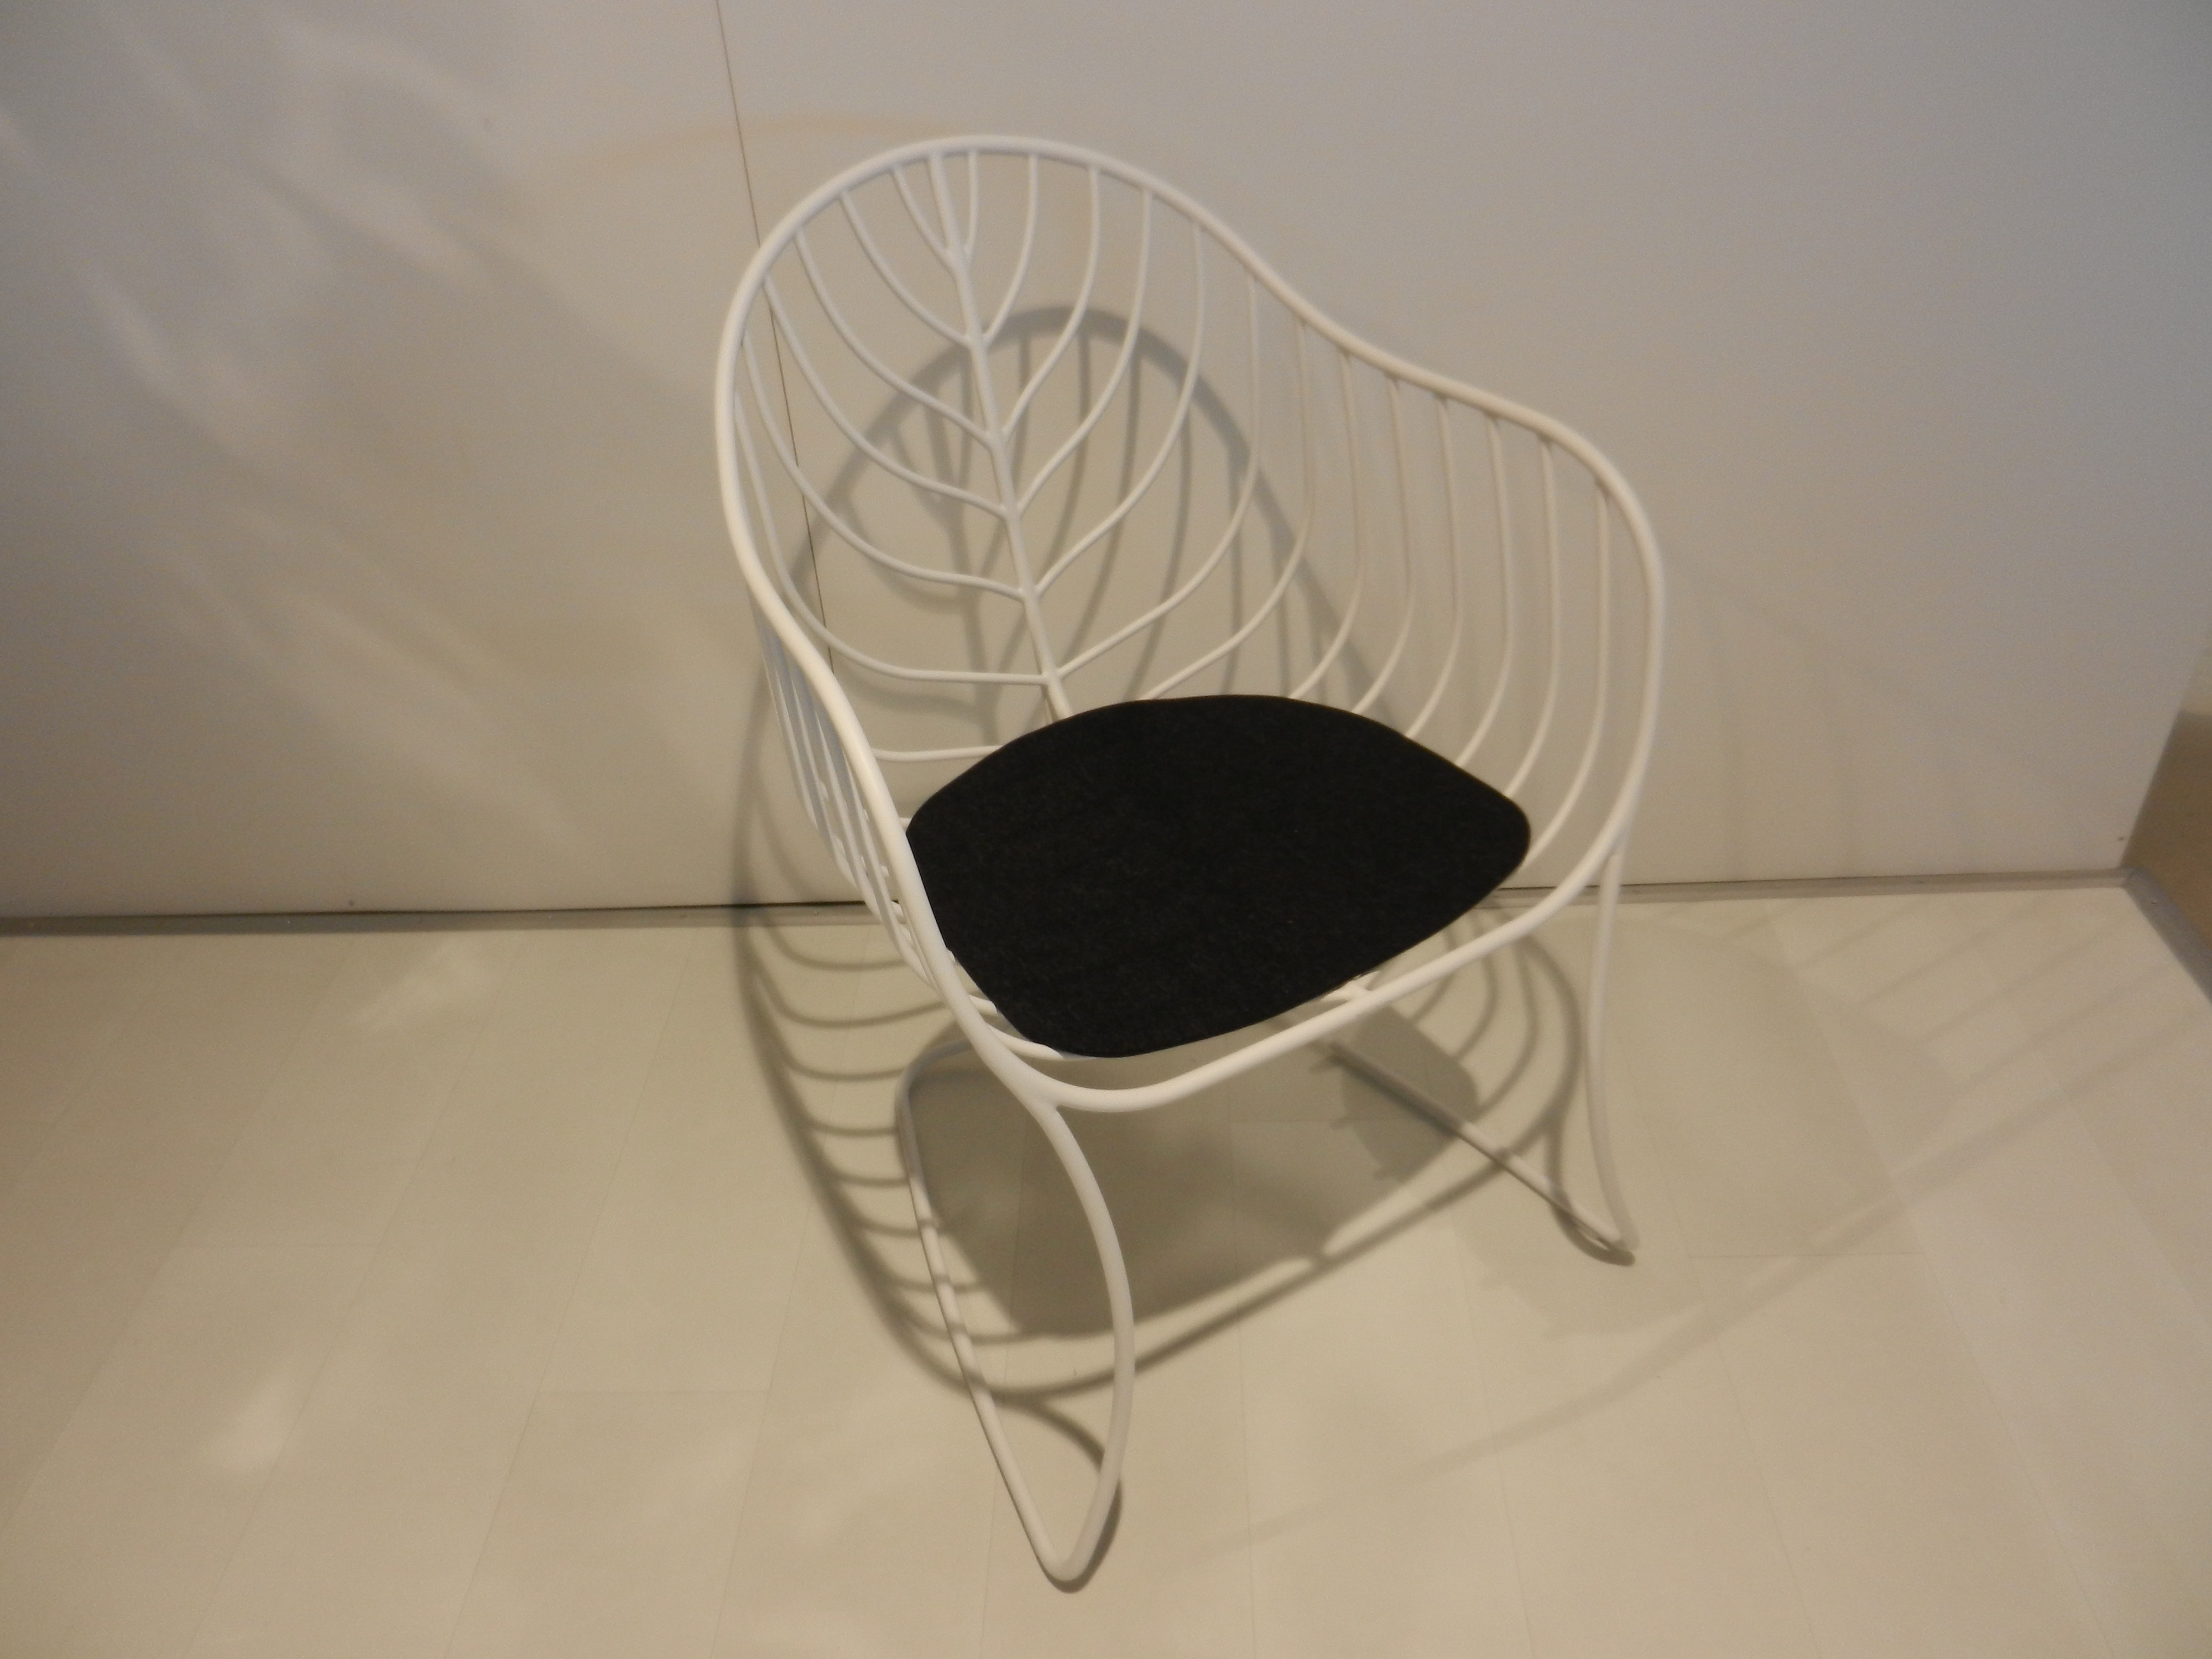 4 Stühle Folia von Royal Botania 10